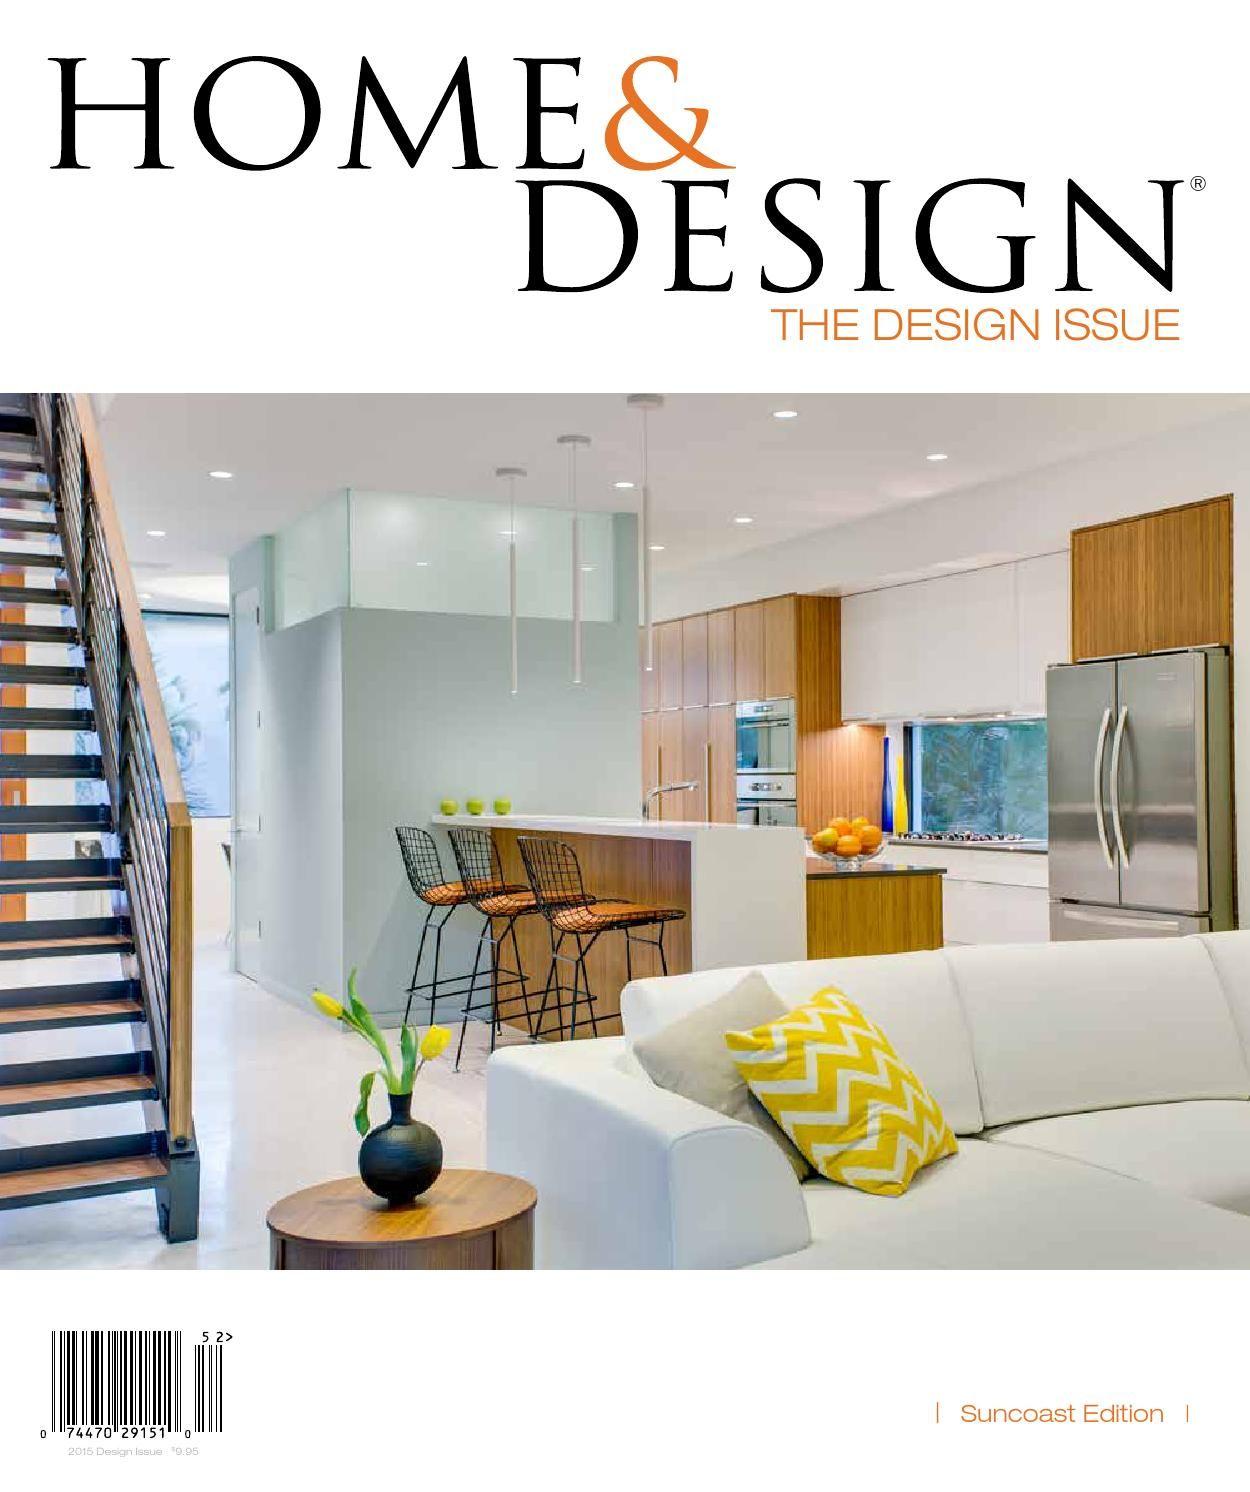 Home Design Magazine Design Issue 2015 Suncoast Florida Edition Home Design Magazines Design House Design